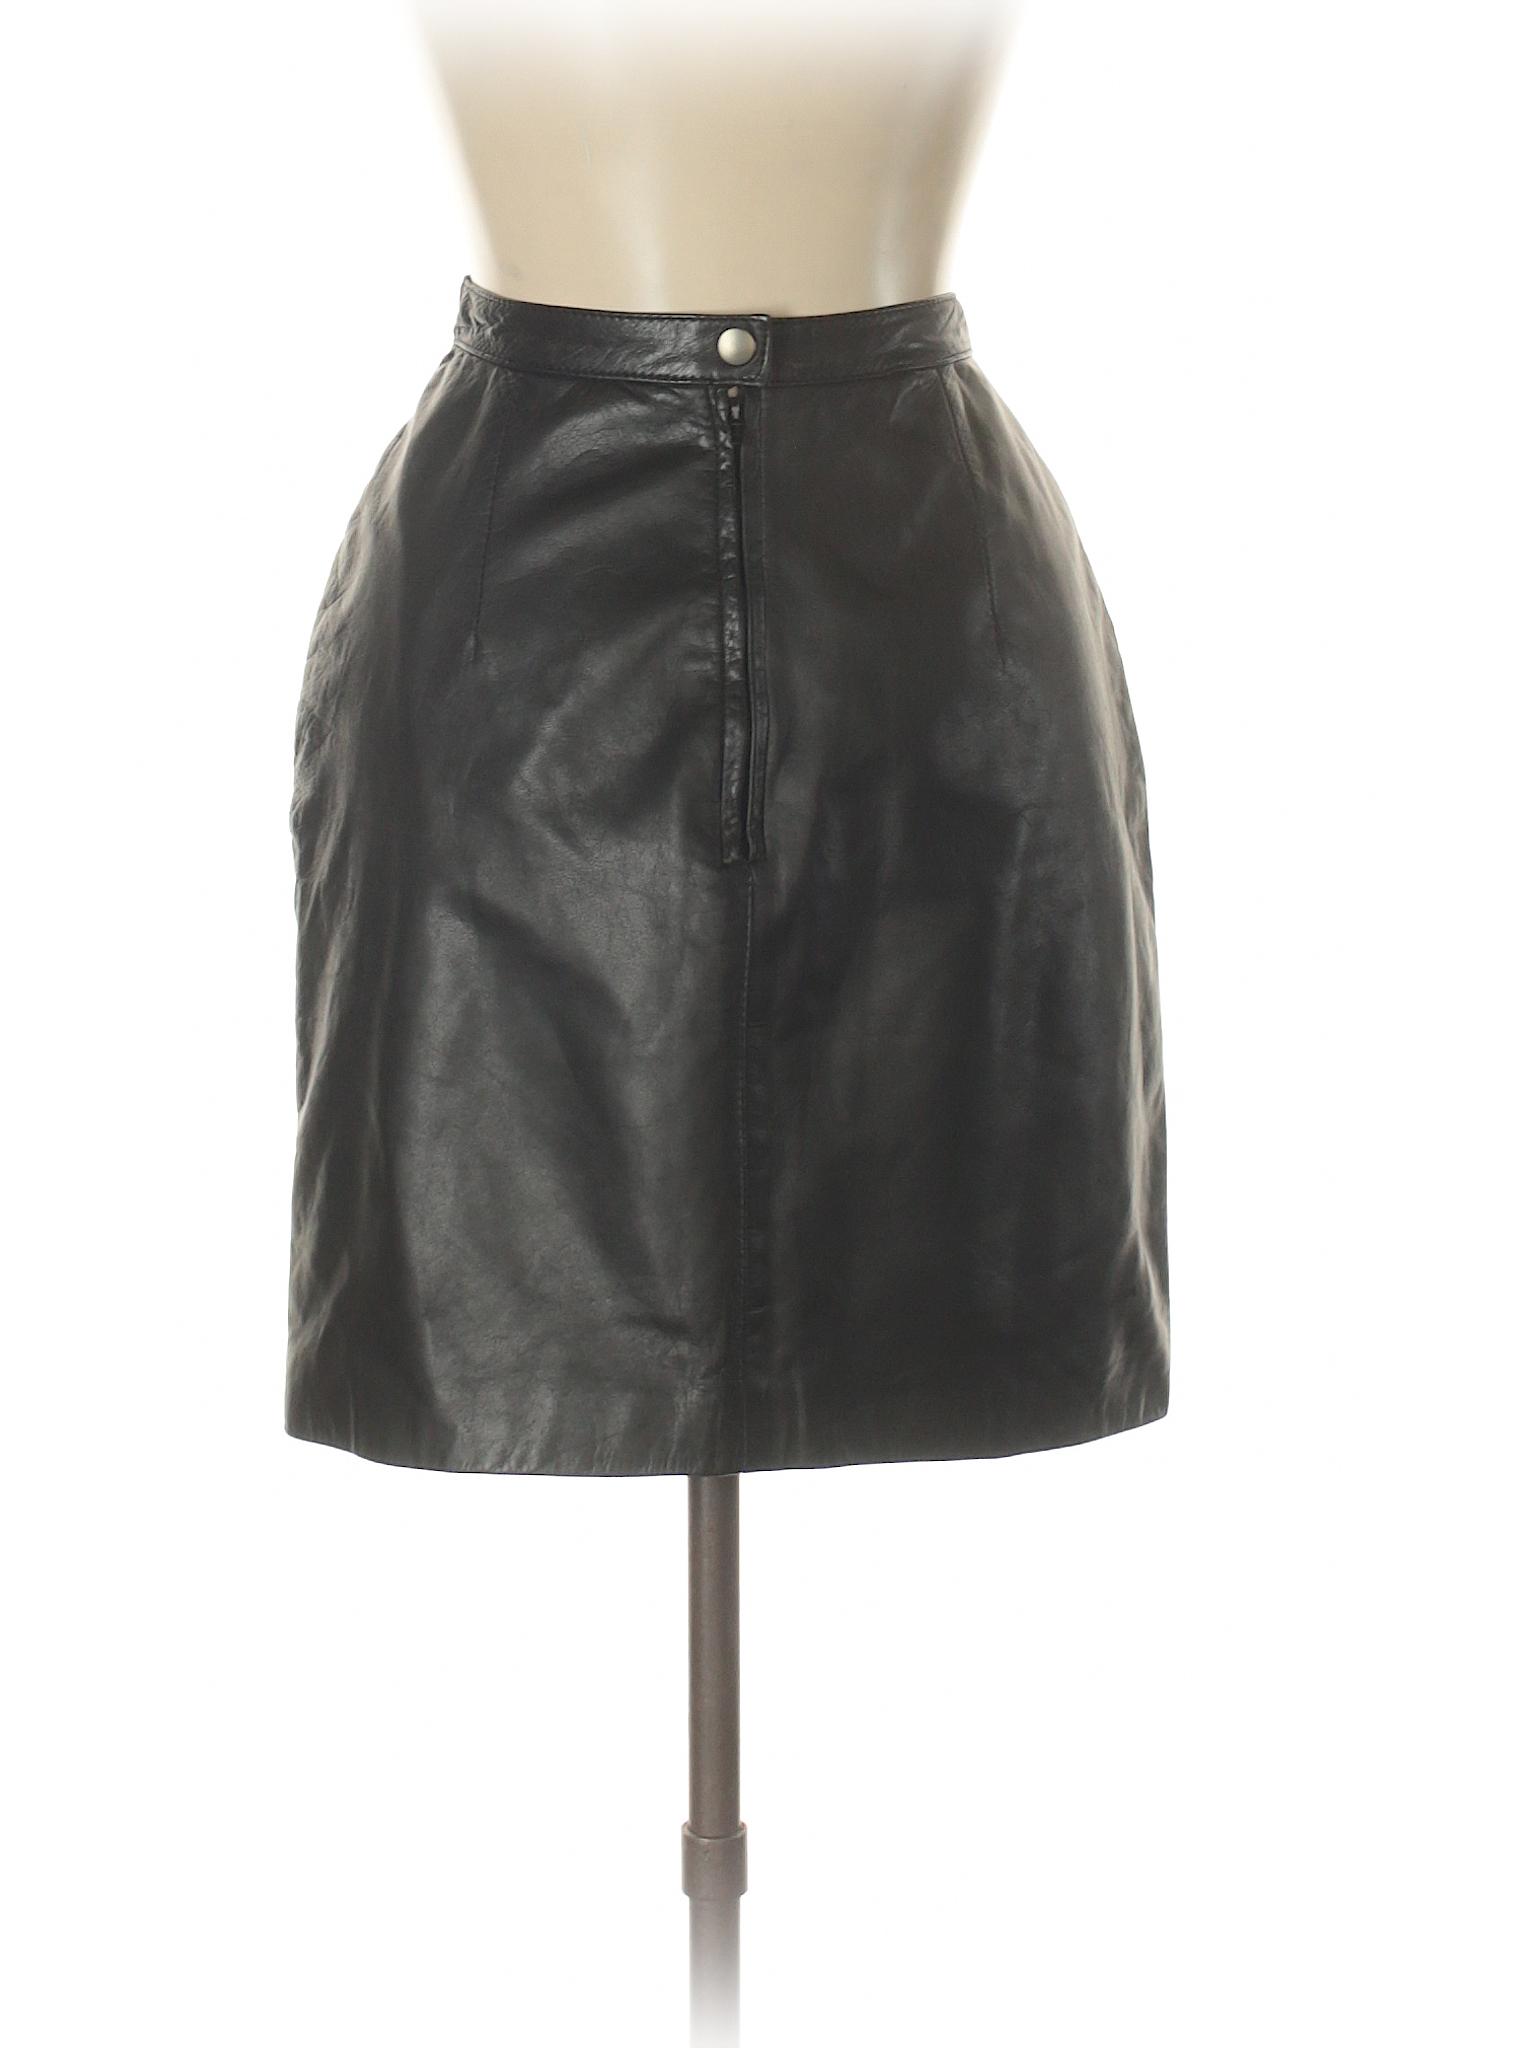 Boutique Boutique Leather Skirt Leather Skirt rOqwrEg